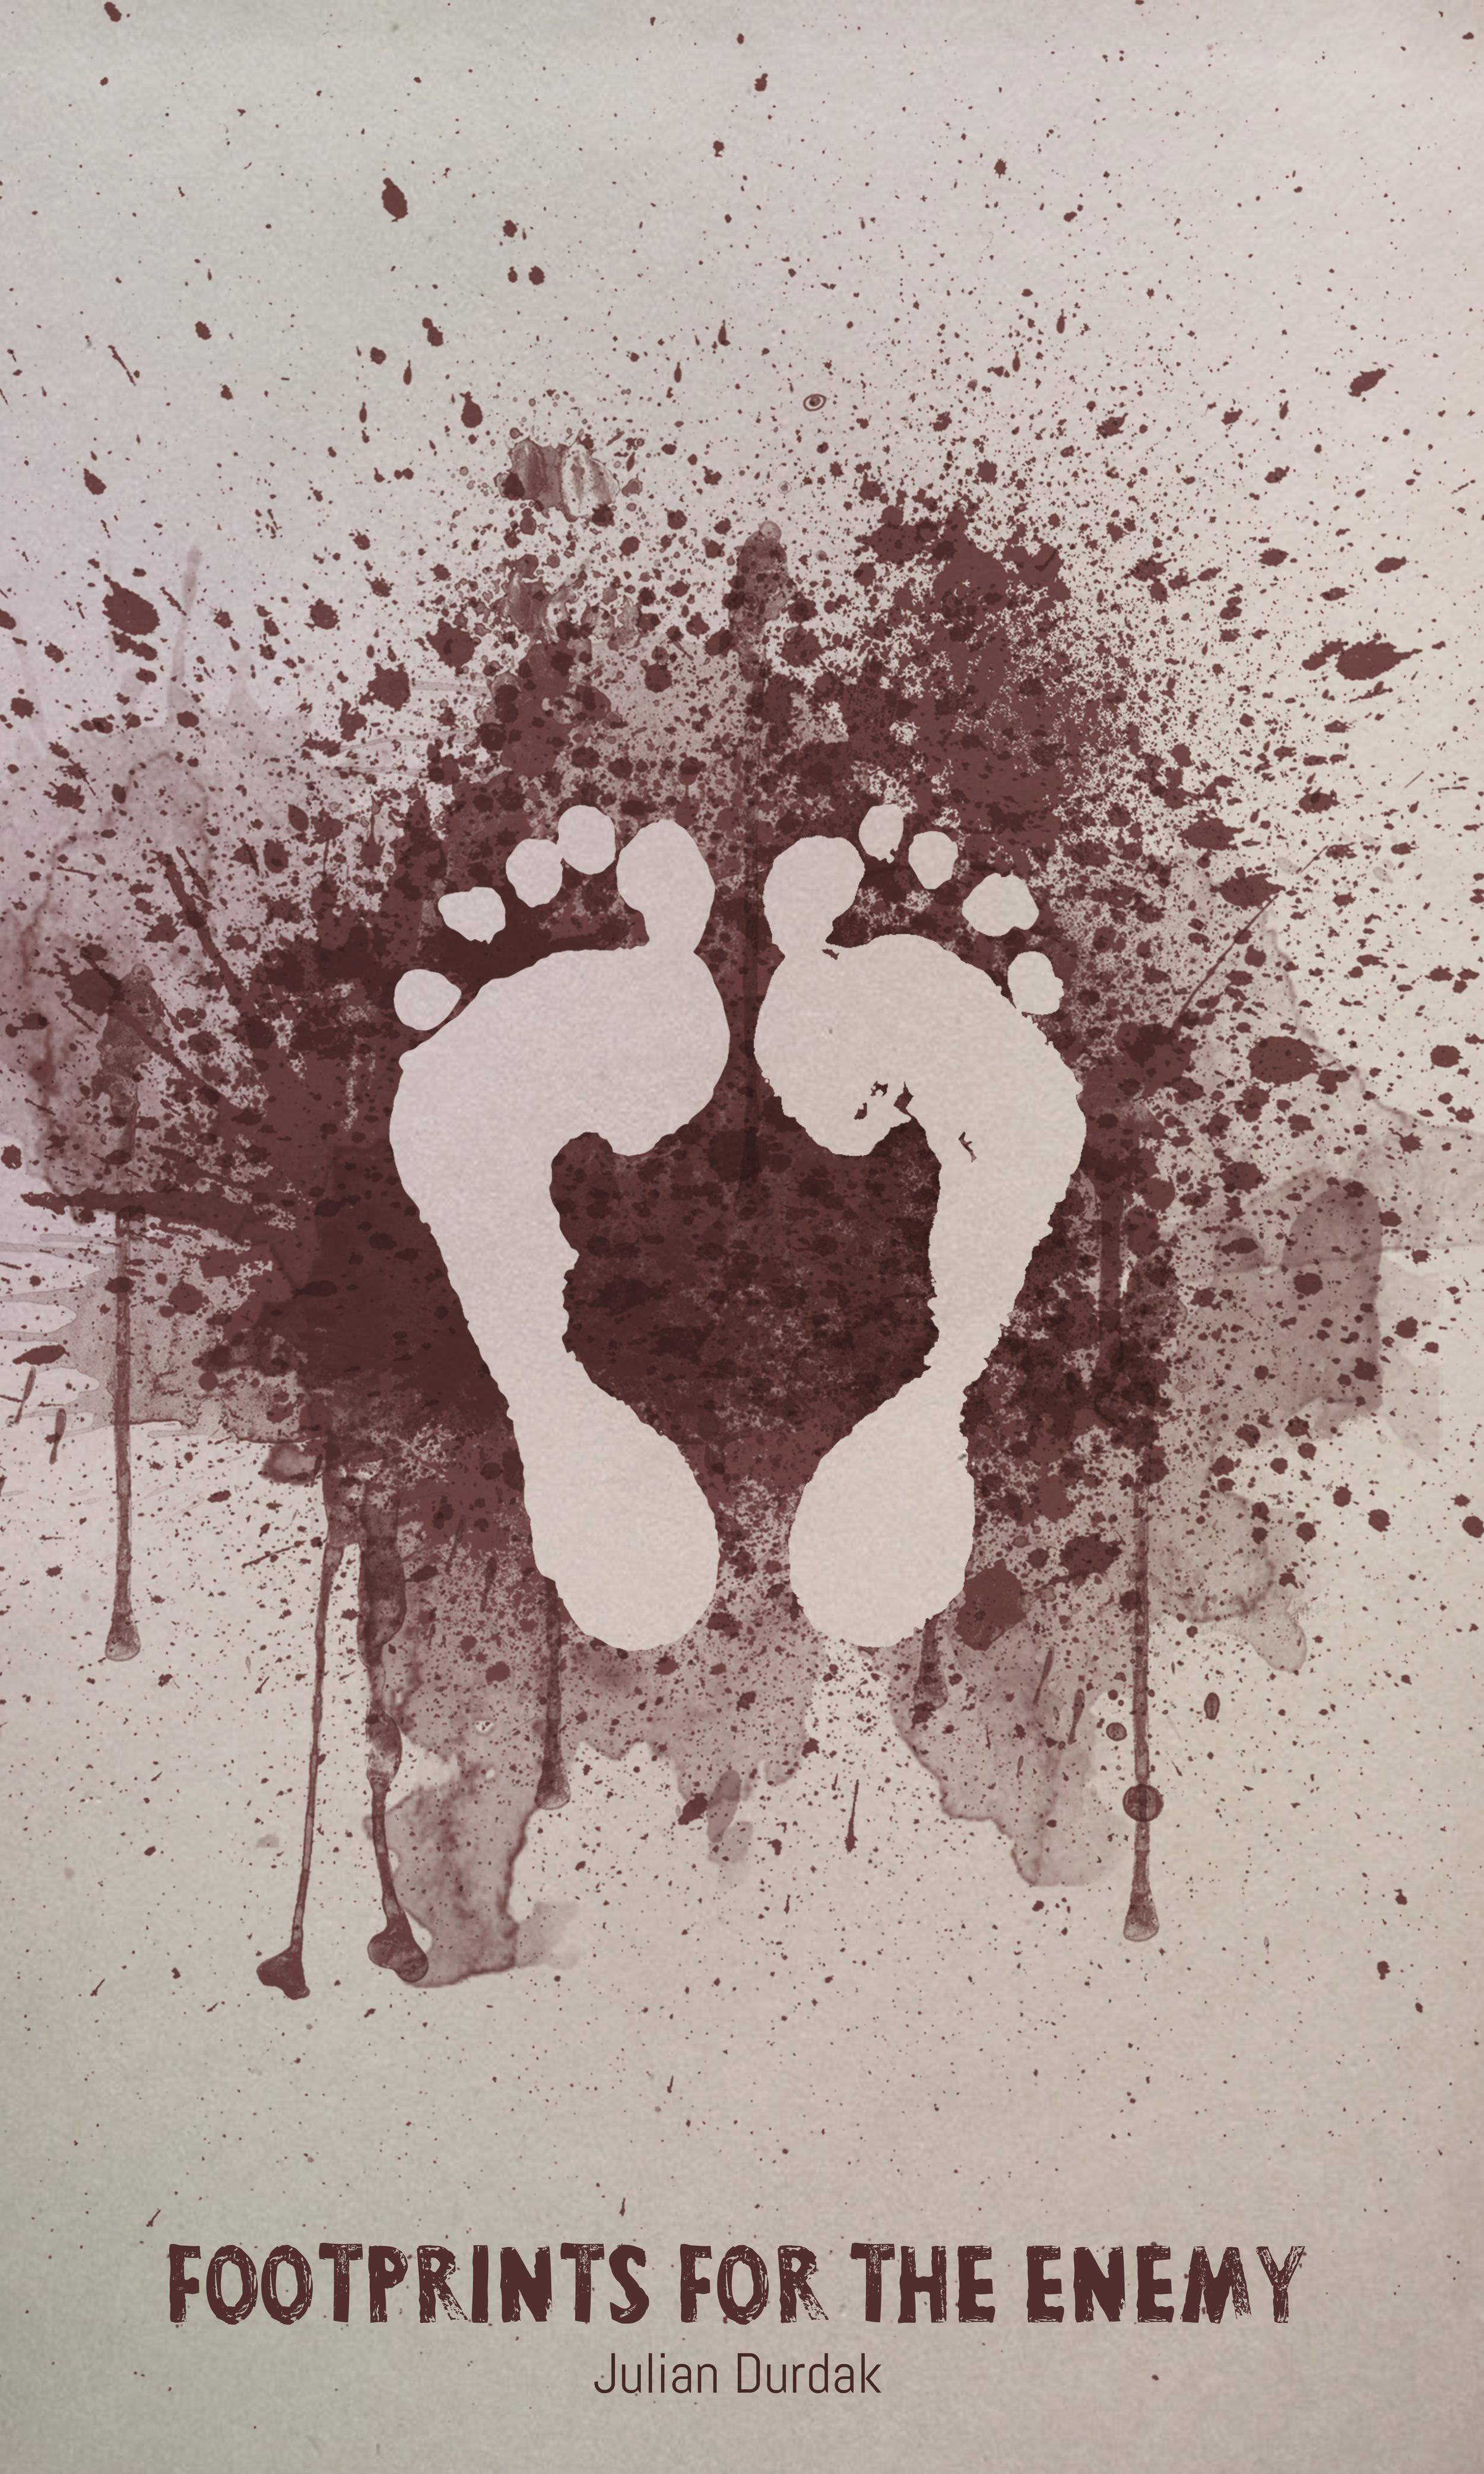 FootprintsForTheEnemy.jpg